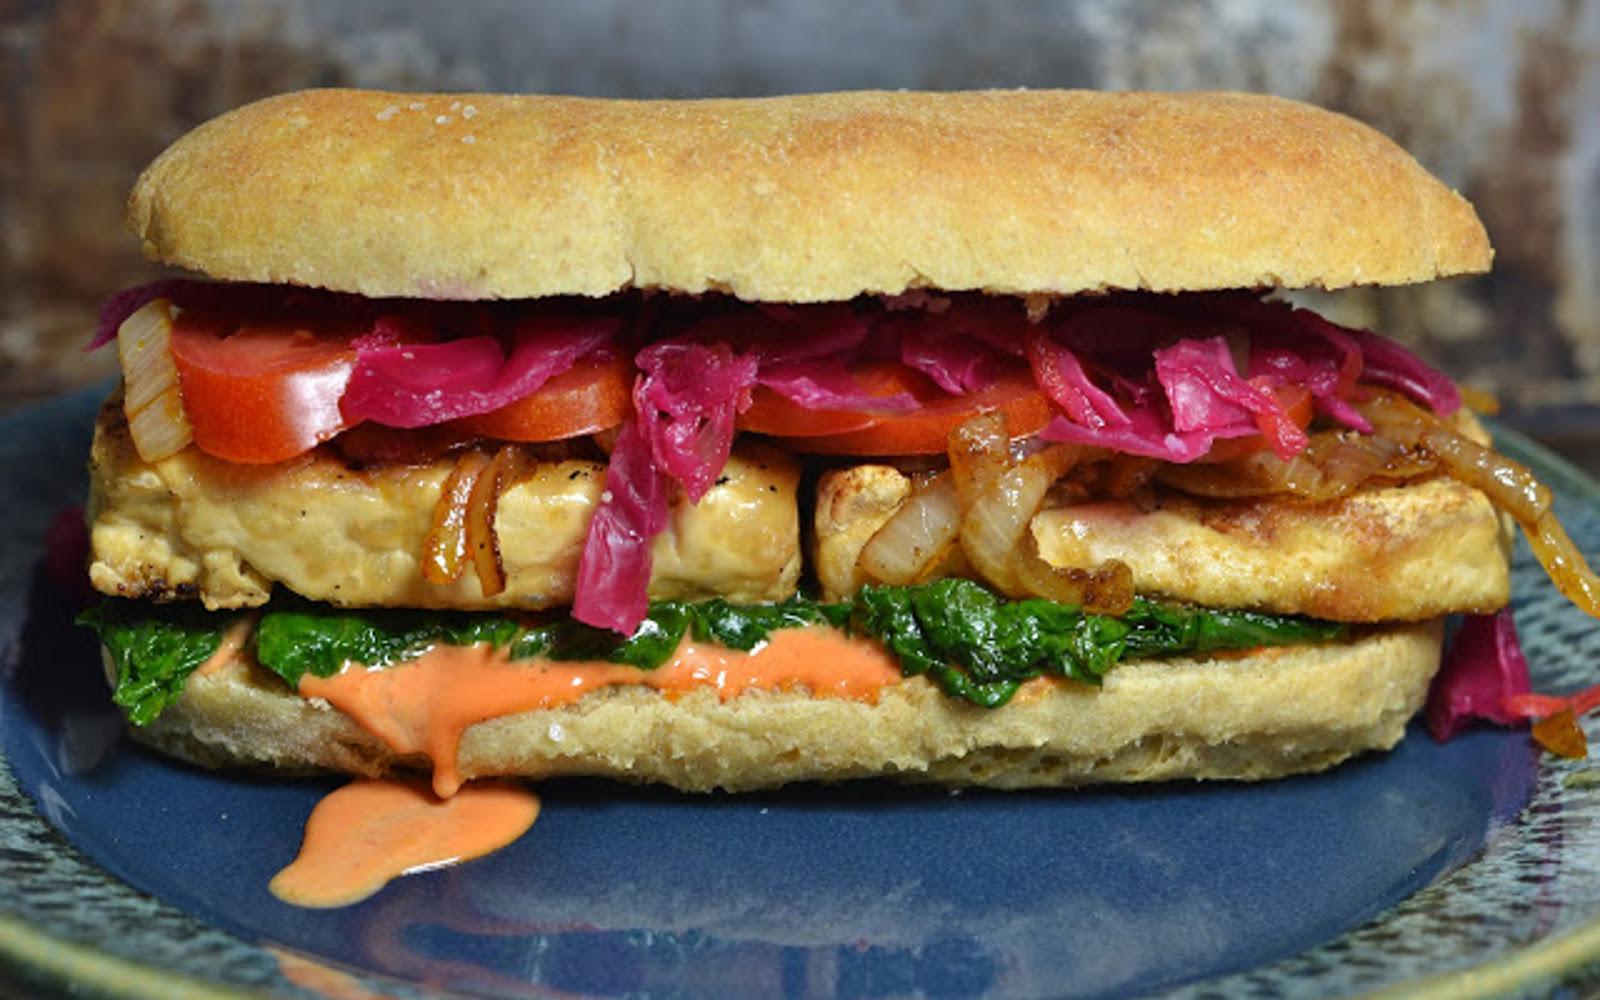 Vegan Loaded Roasted Tofu Dinner Sandwiches